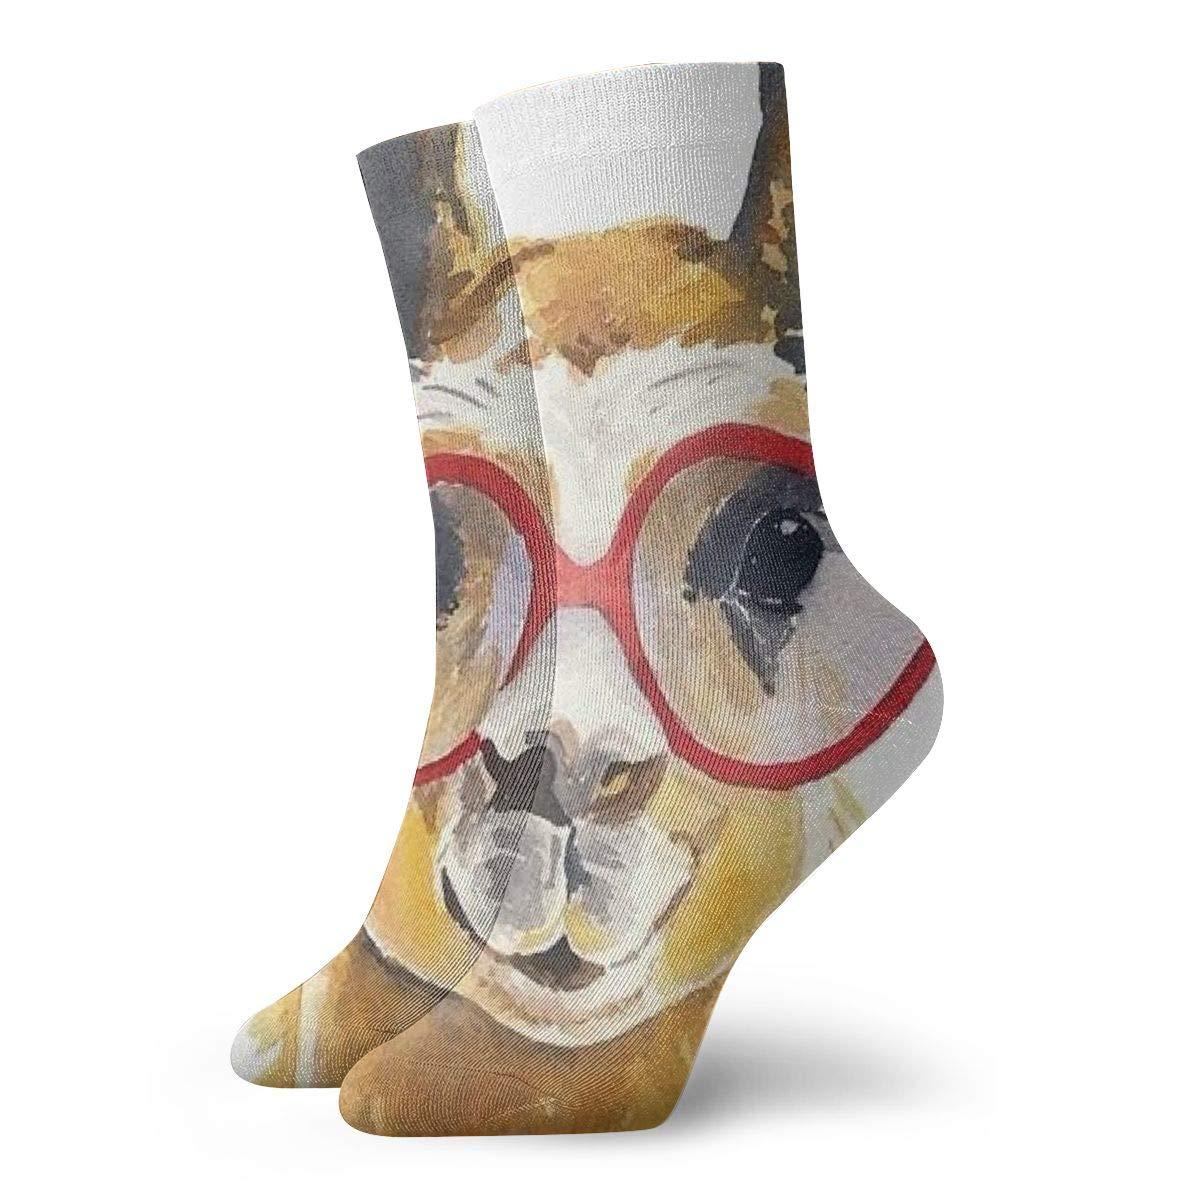 Unisex High Ankle Cushion Crew Socks Alpaca Painting Casual Sport Socks